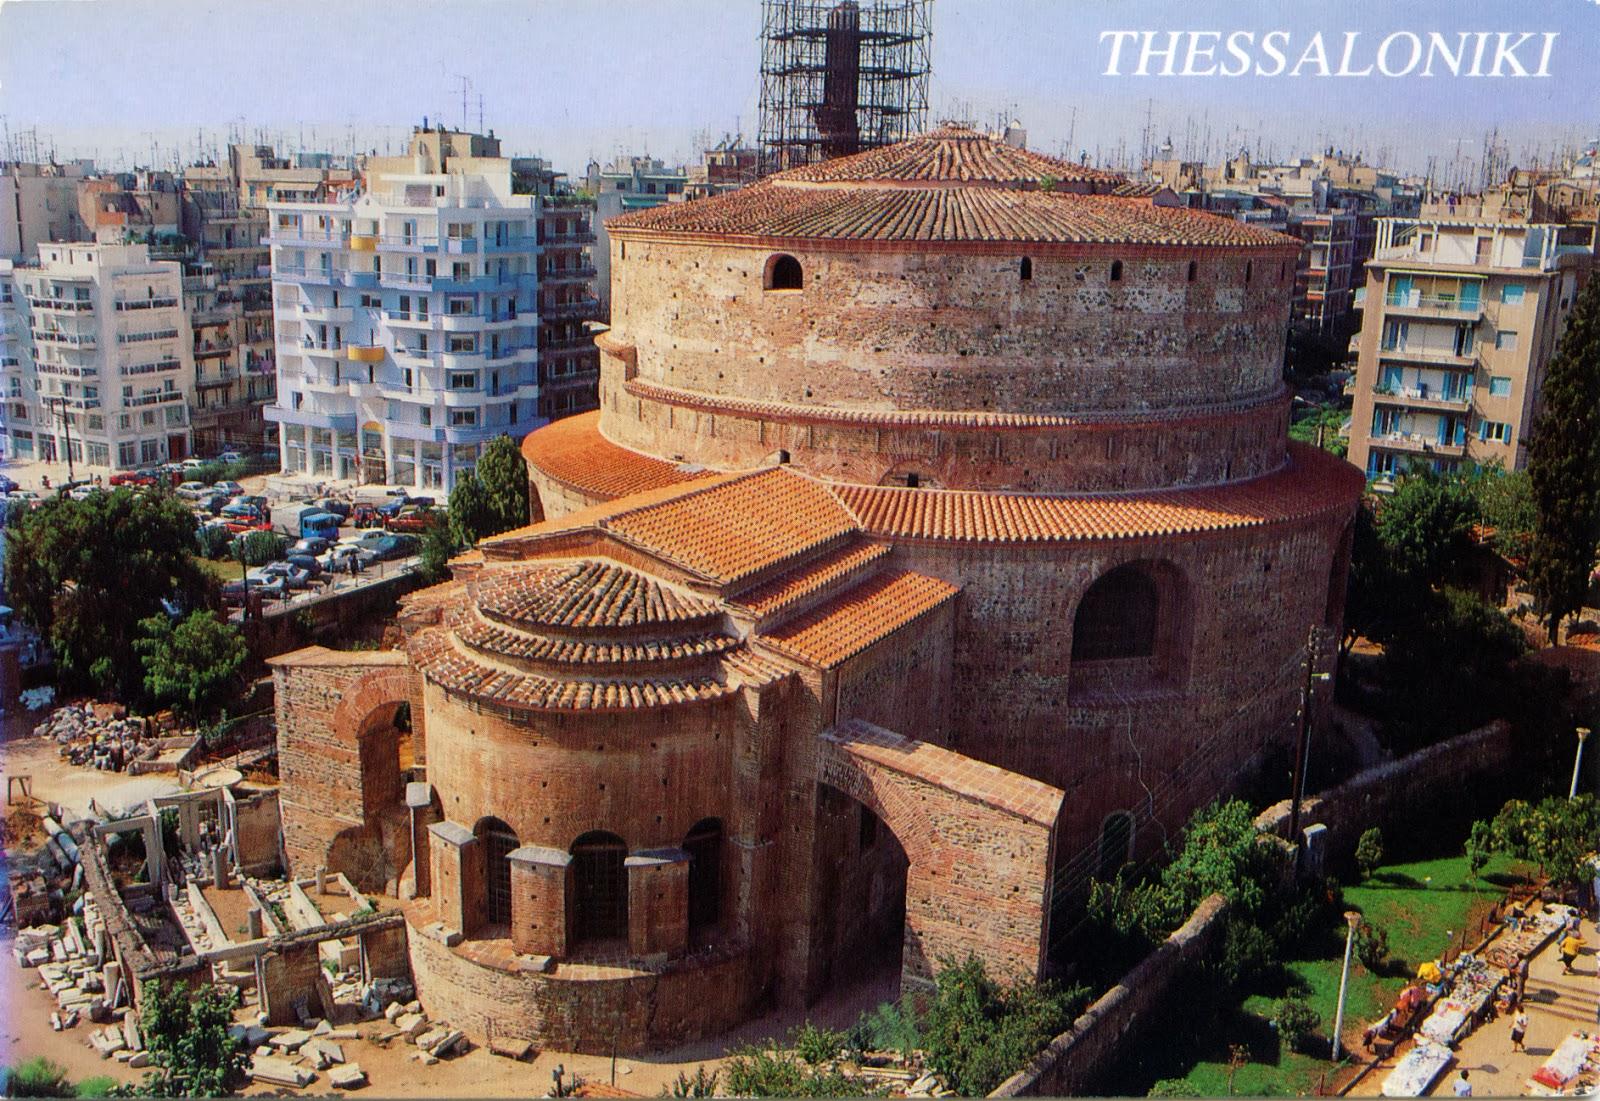 Byzantine Thessaloniki 36